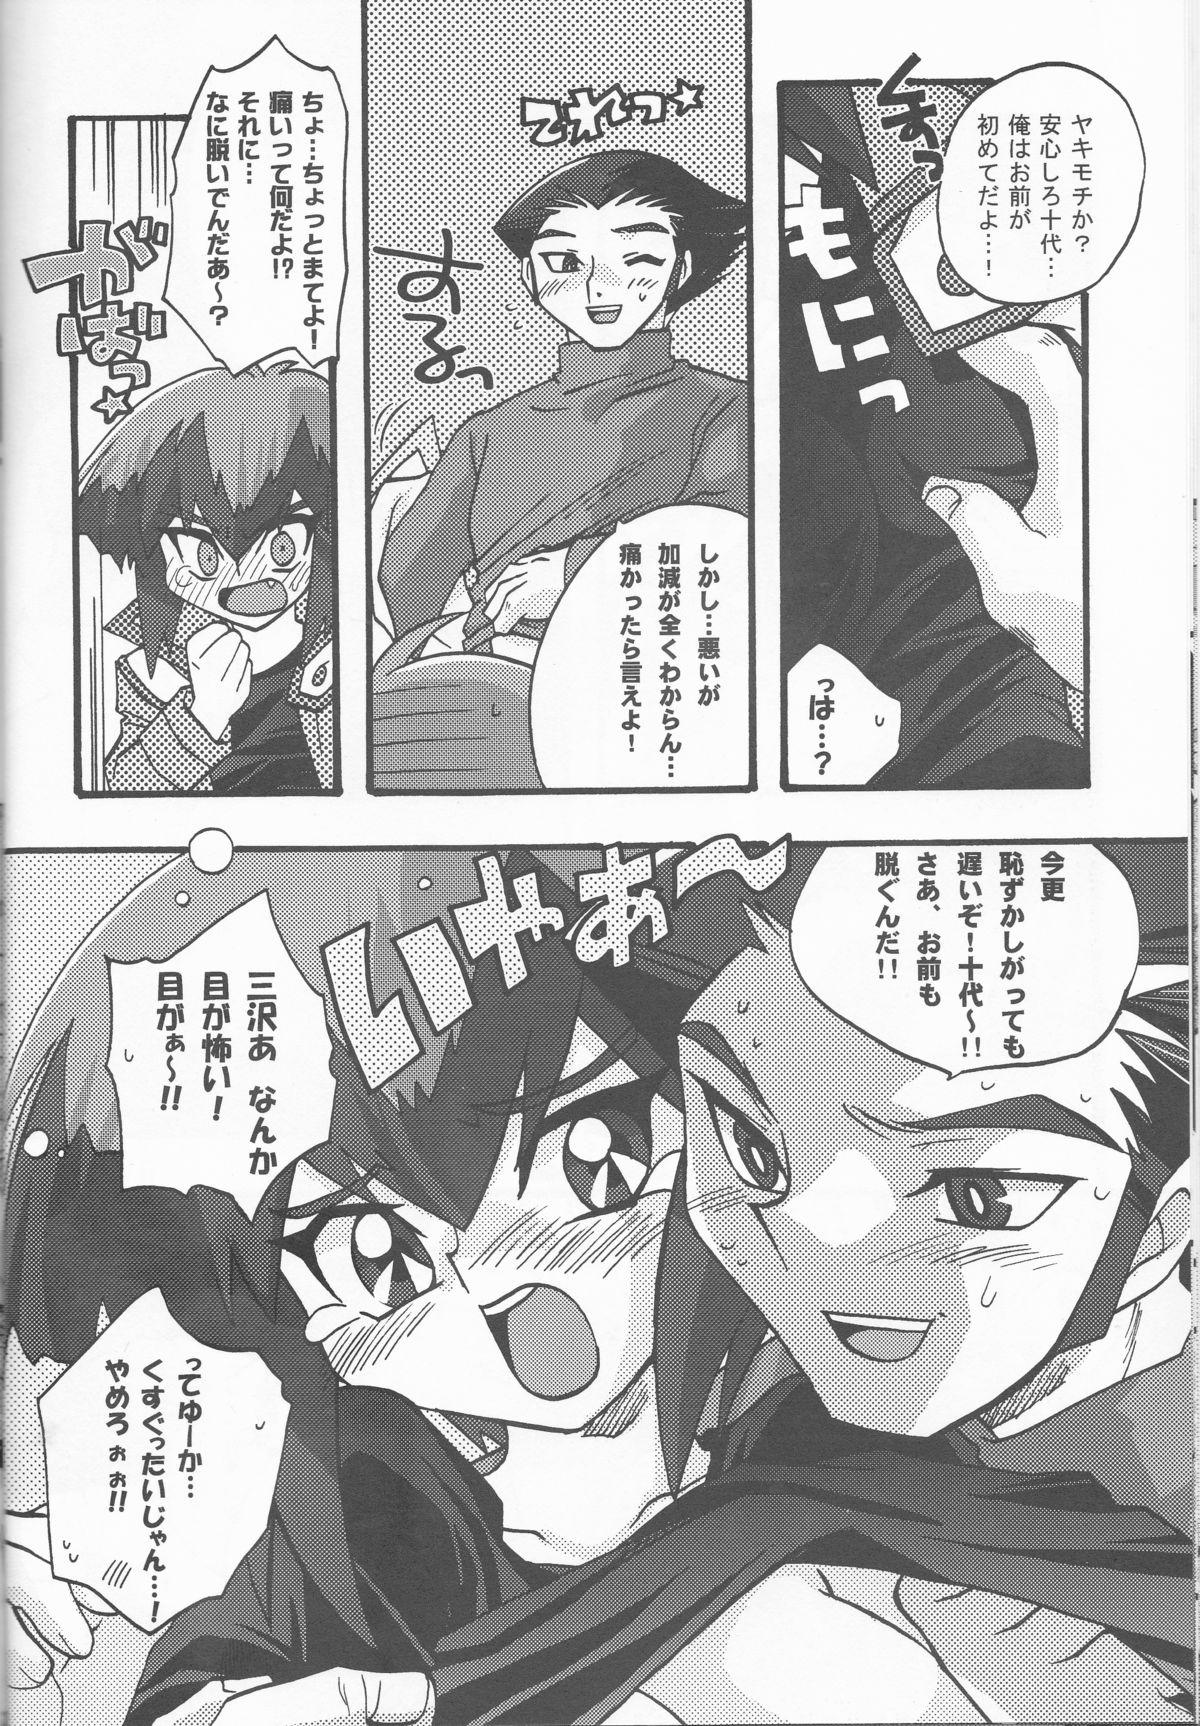 Akuma no Kuchiduke Devil's Kiss 23